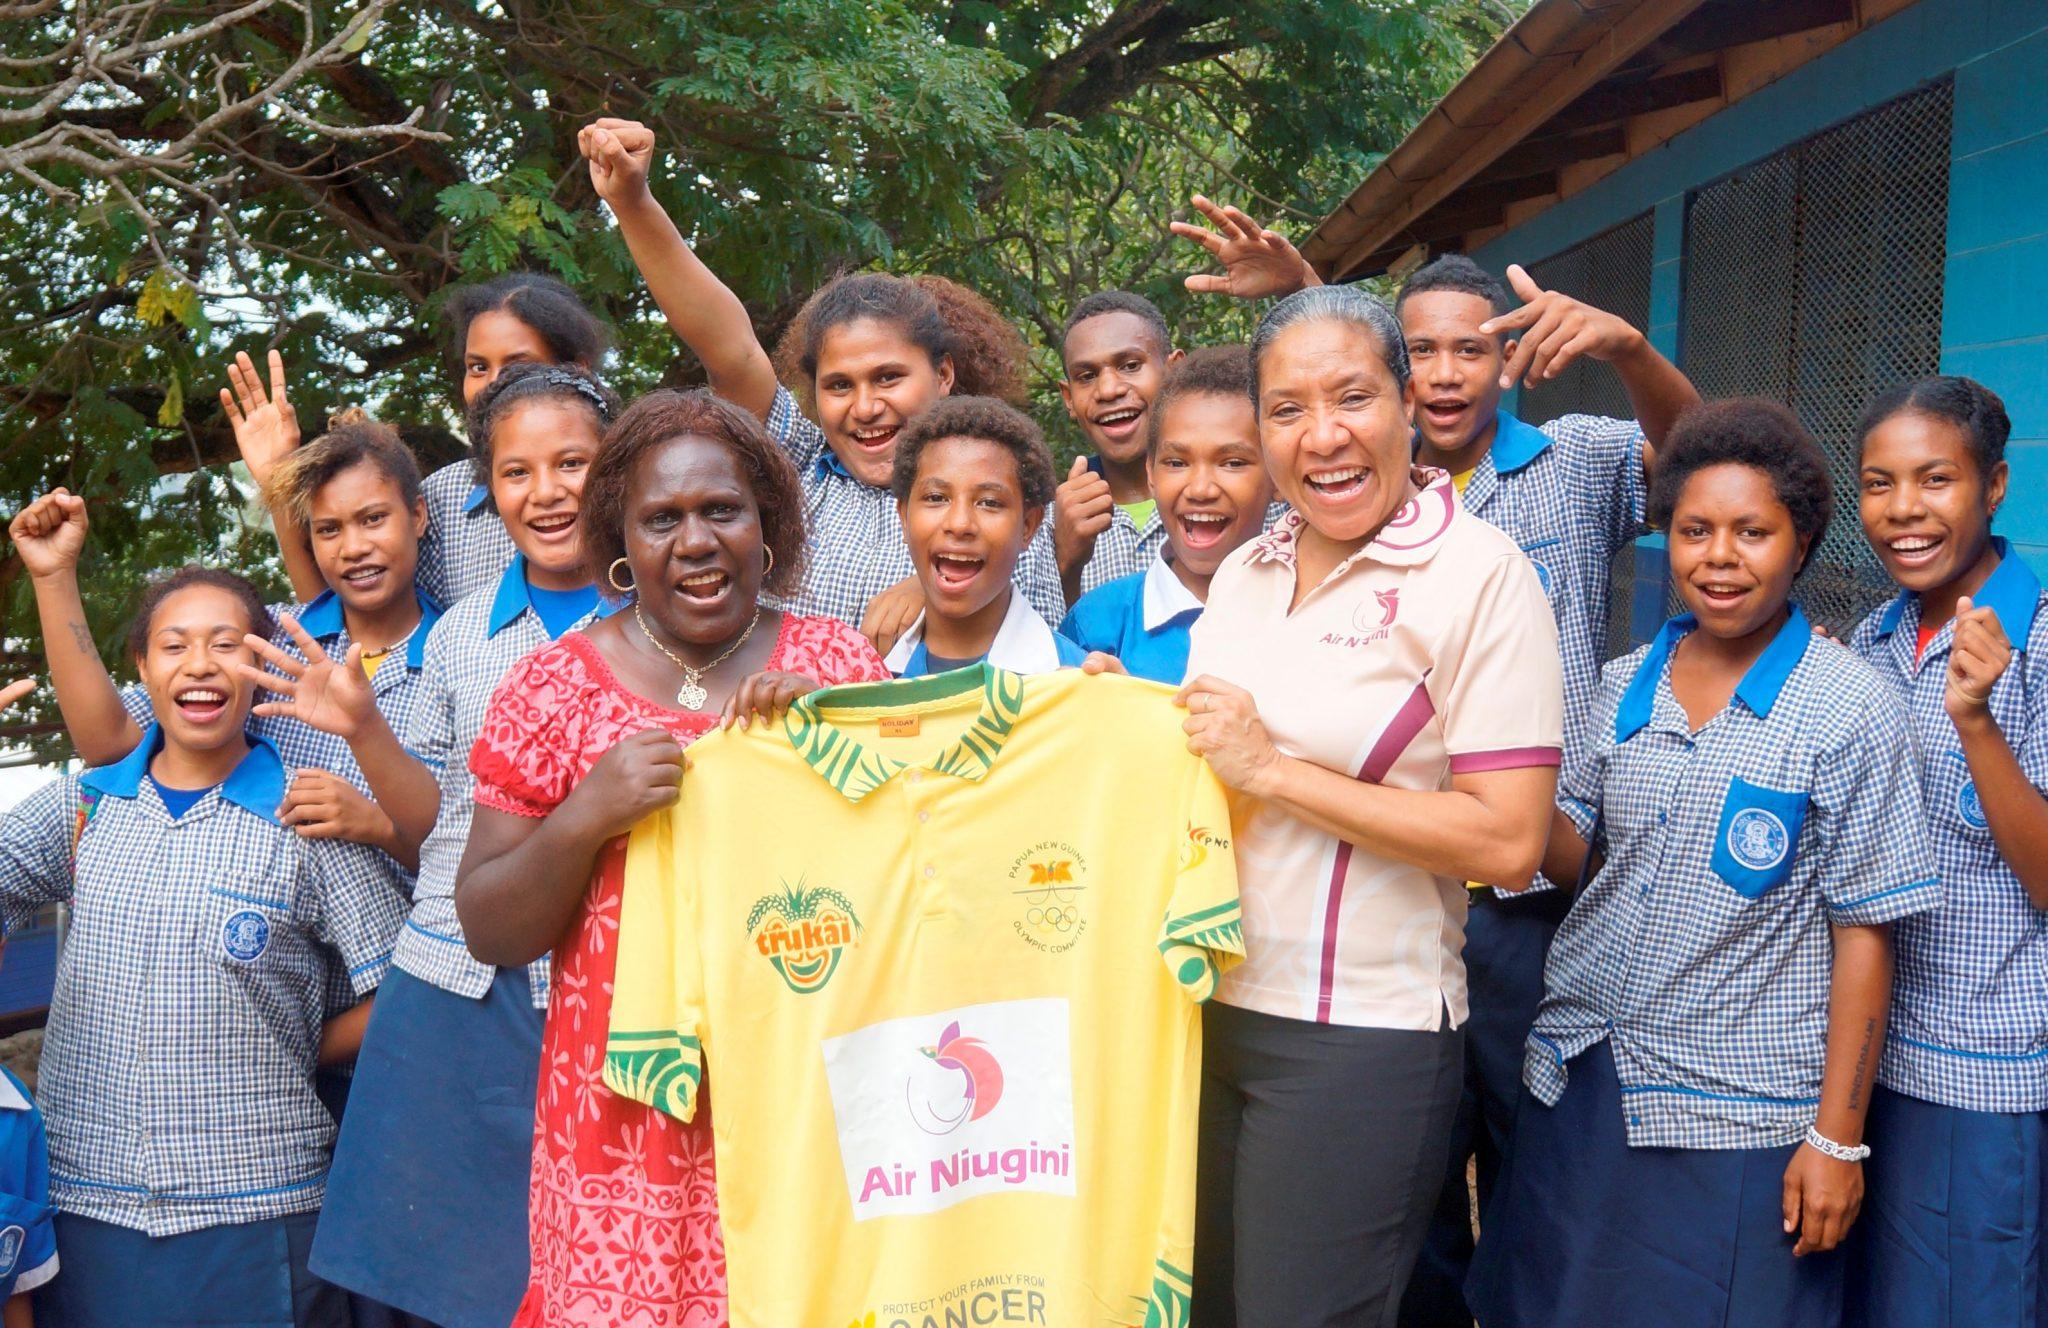 Air Niugini presents Fun Run shirts to schools